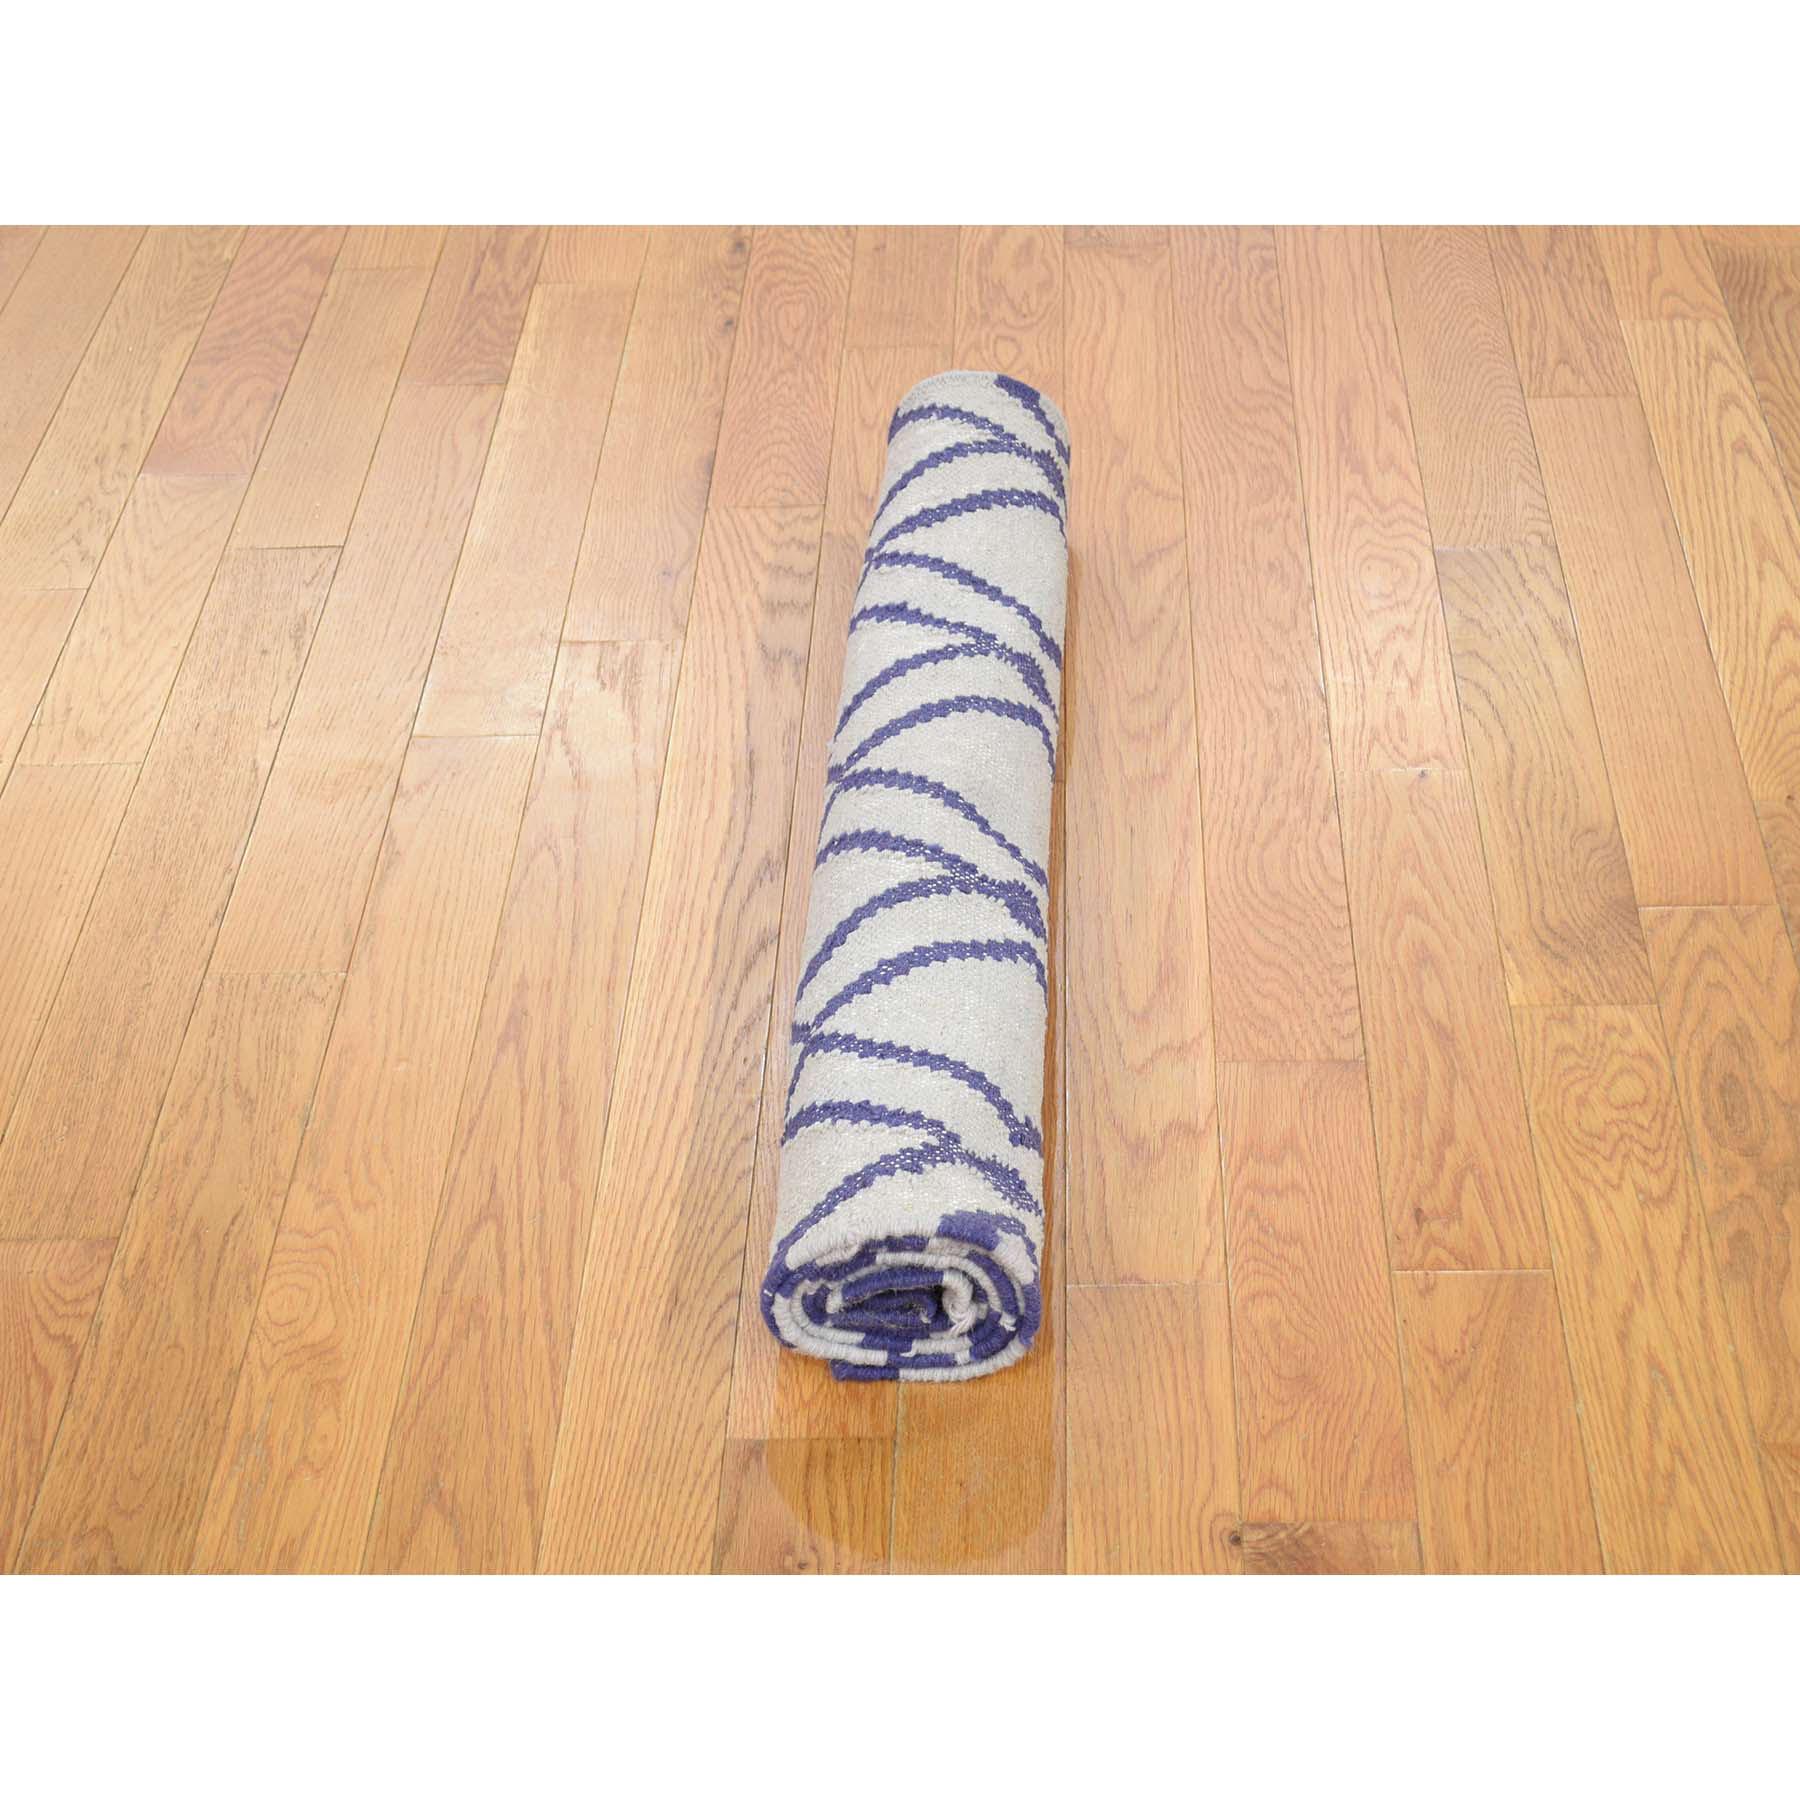 2-6--x6- Hand Woven Runner Durie Kilim Flat Weave Reversible Rug